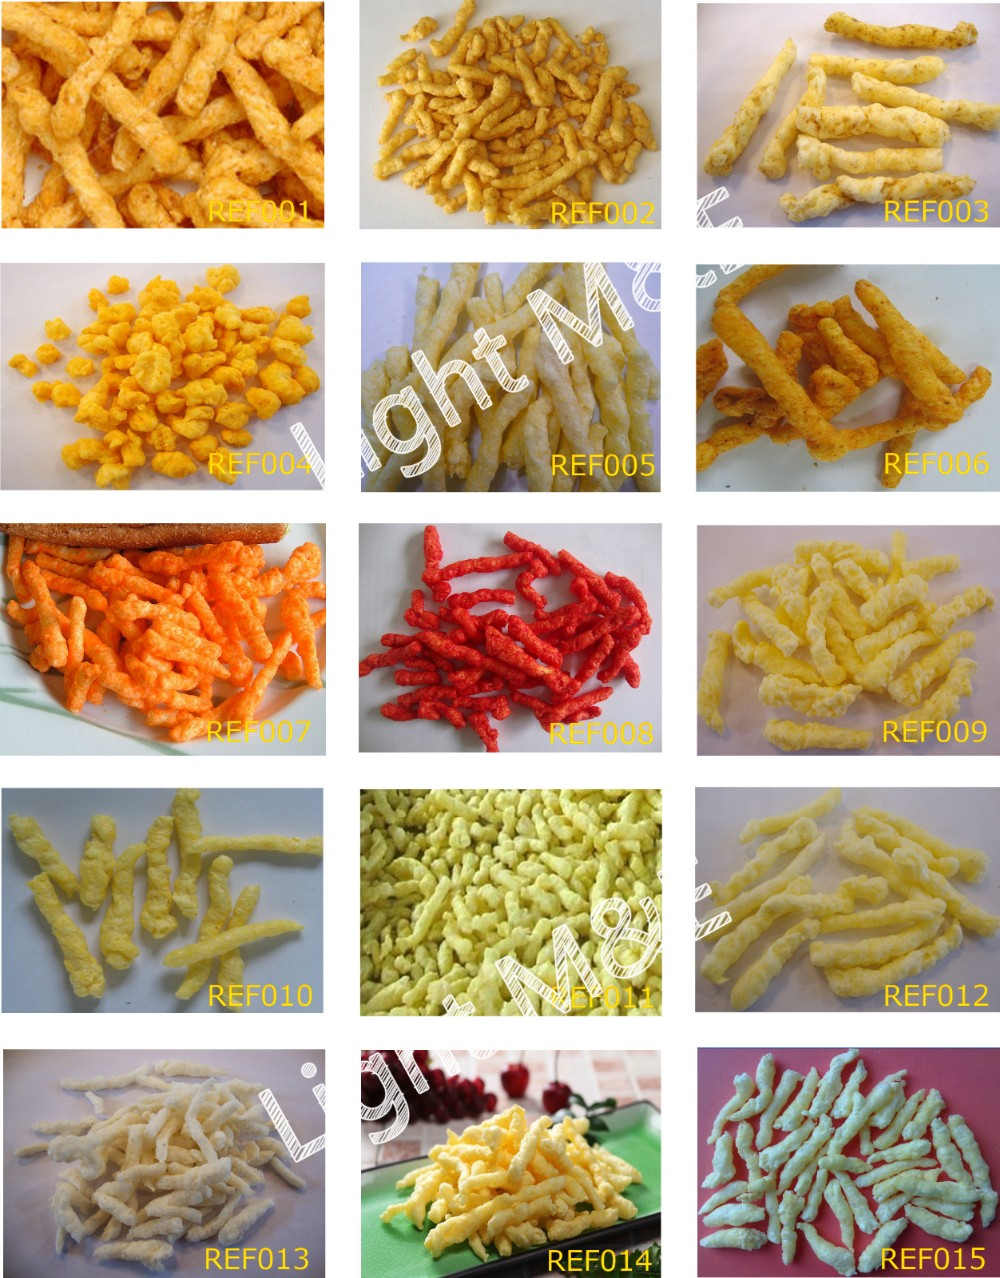 Kurkure Cheetos Niknaks Corn Curls